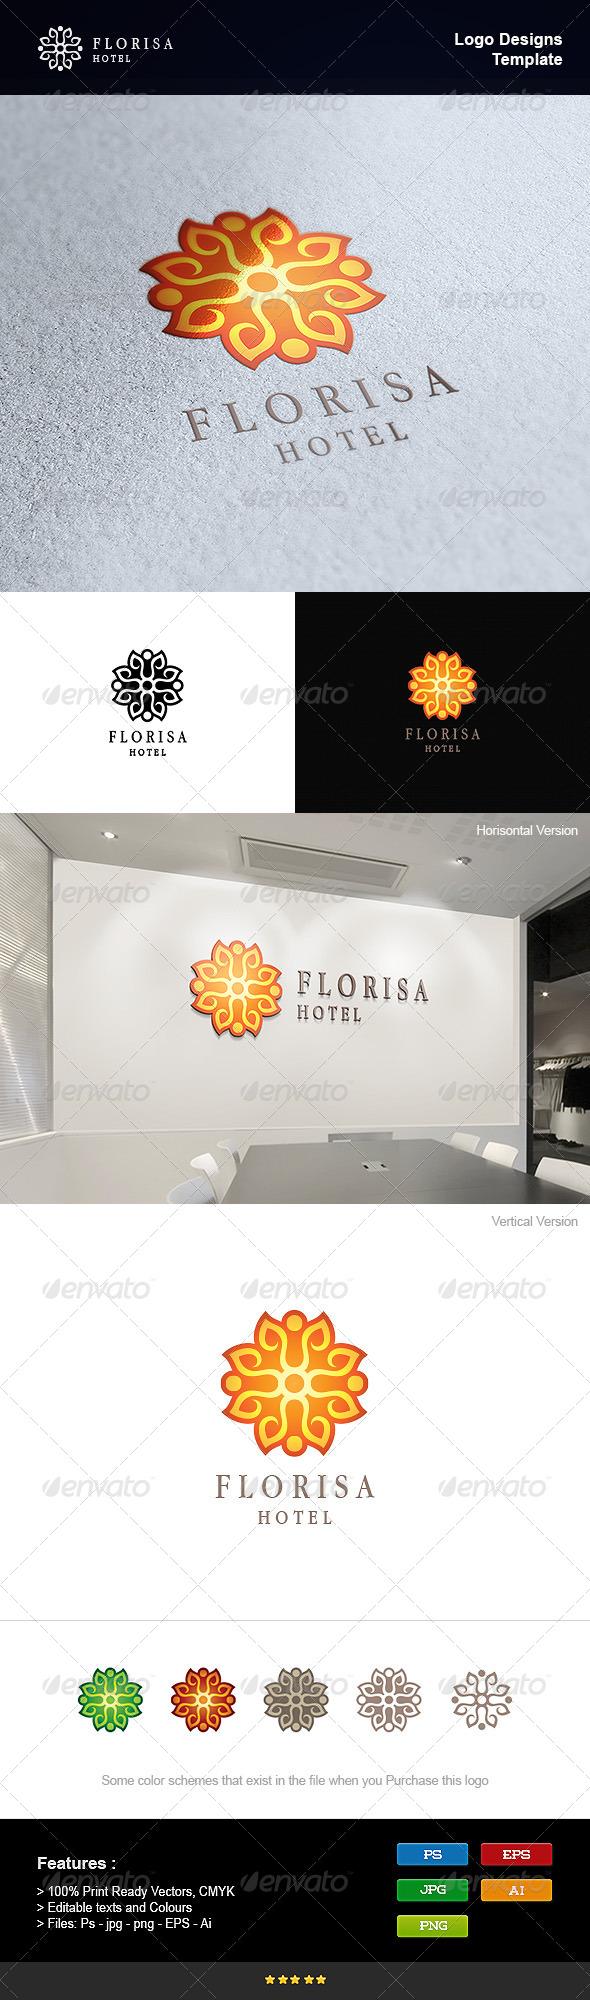 GraphicRiver Florist Hotel 8232804